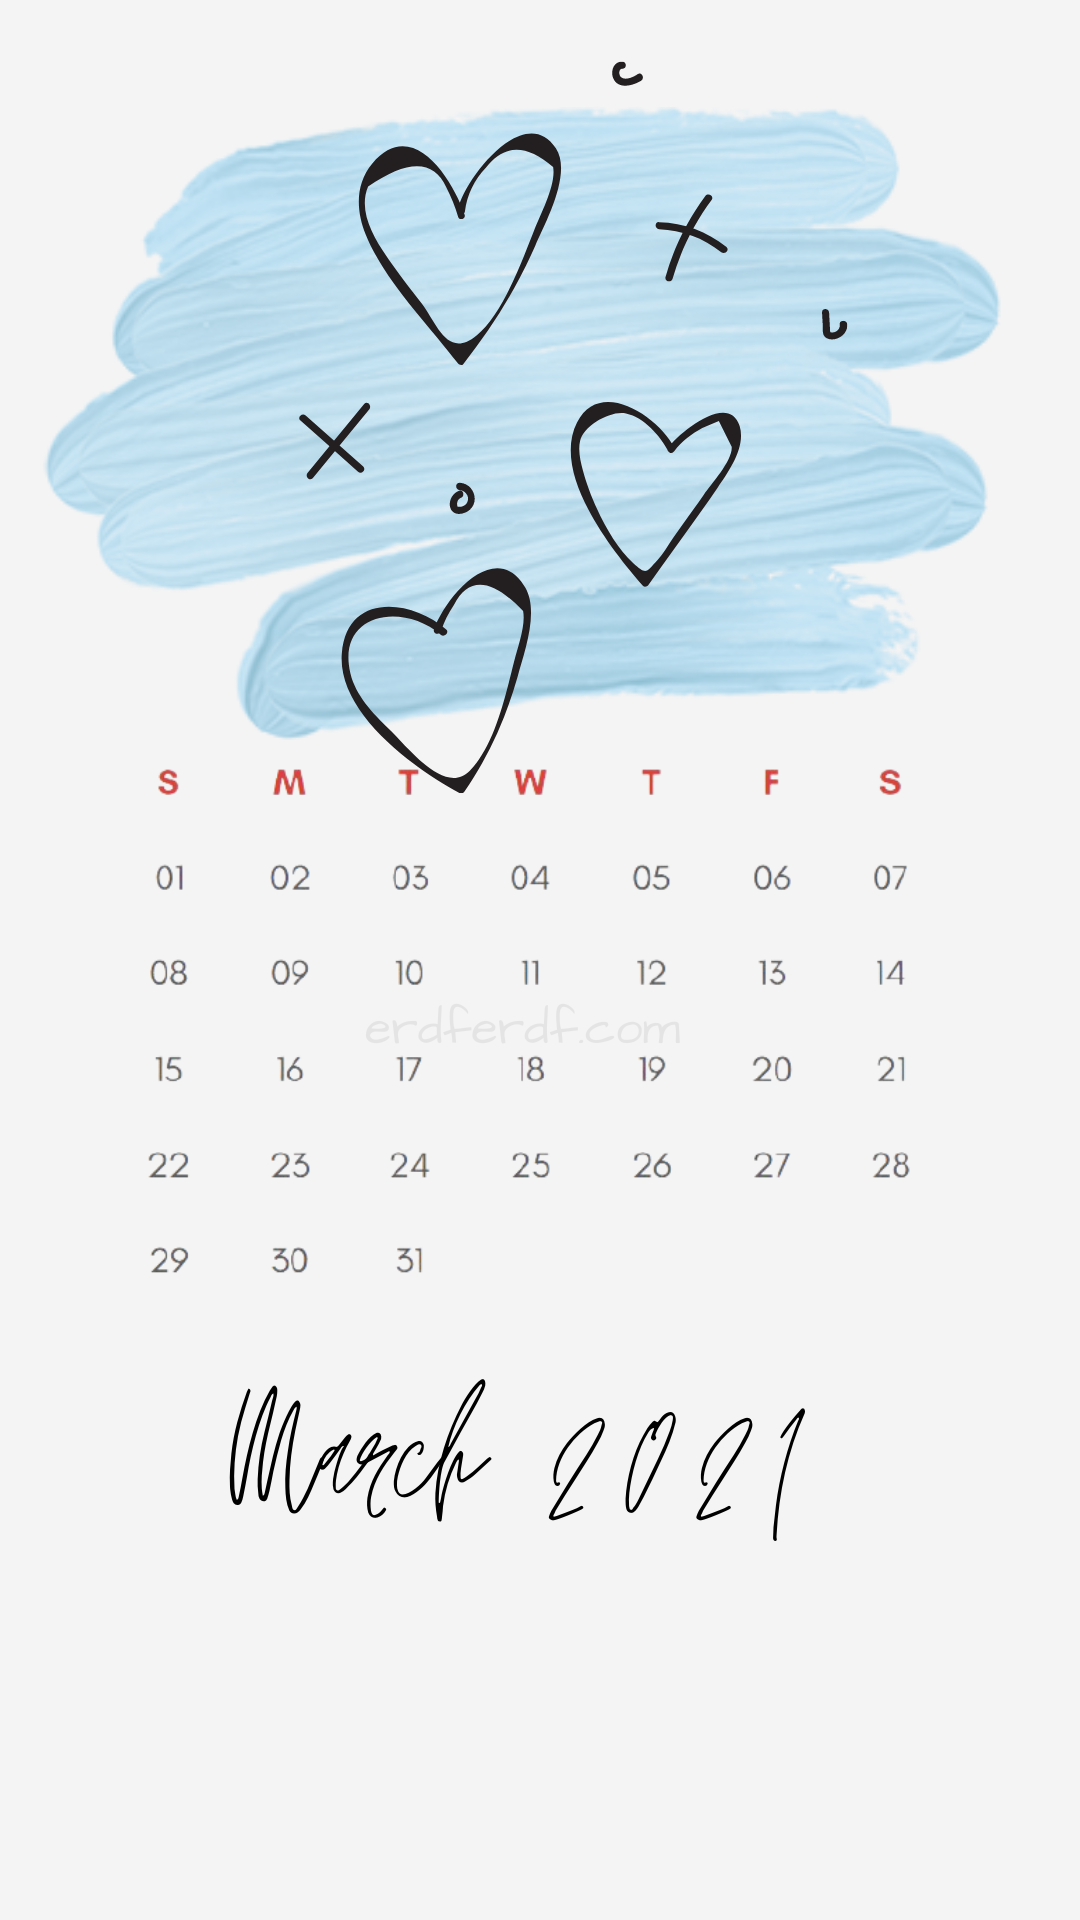 Iphone Wallpaper March 2021 Calendar Free White Love